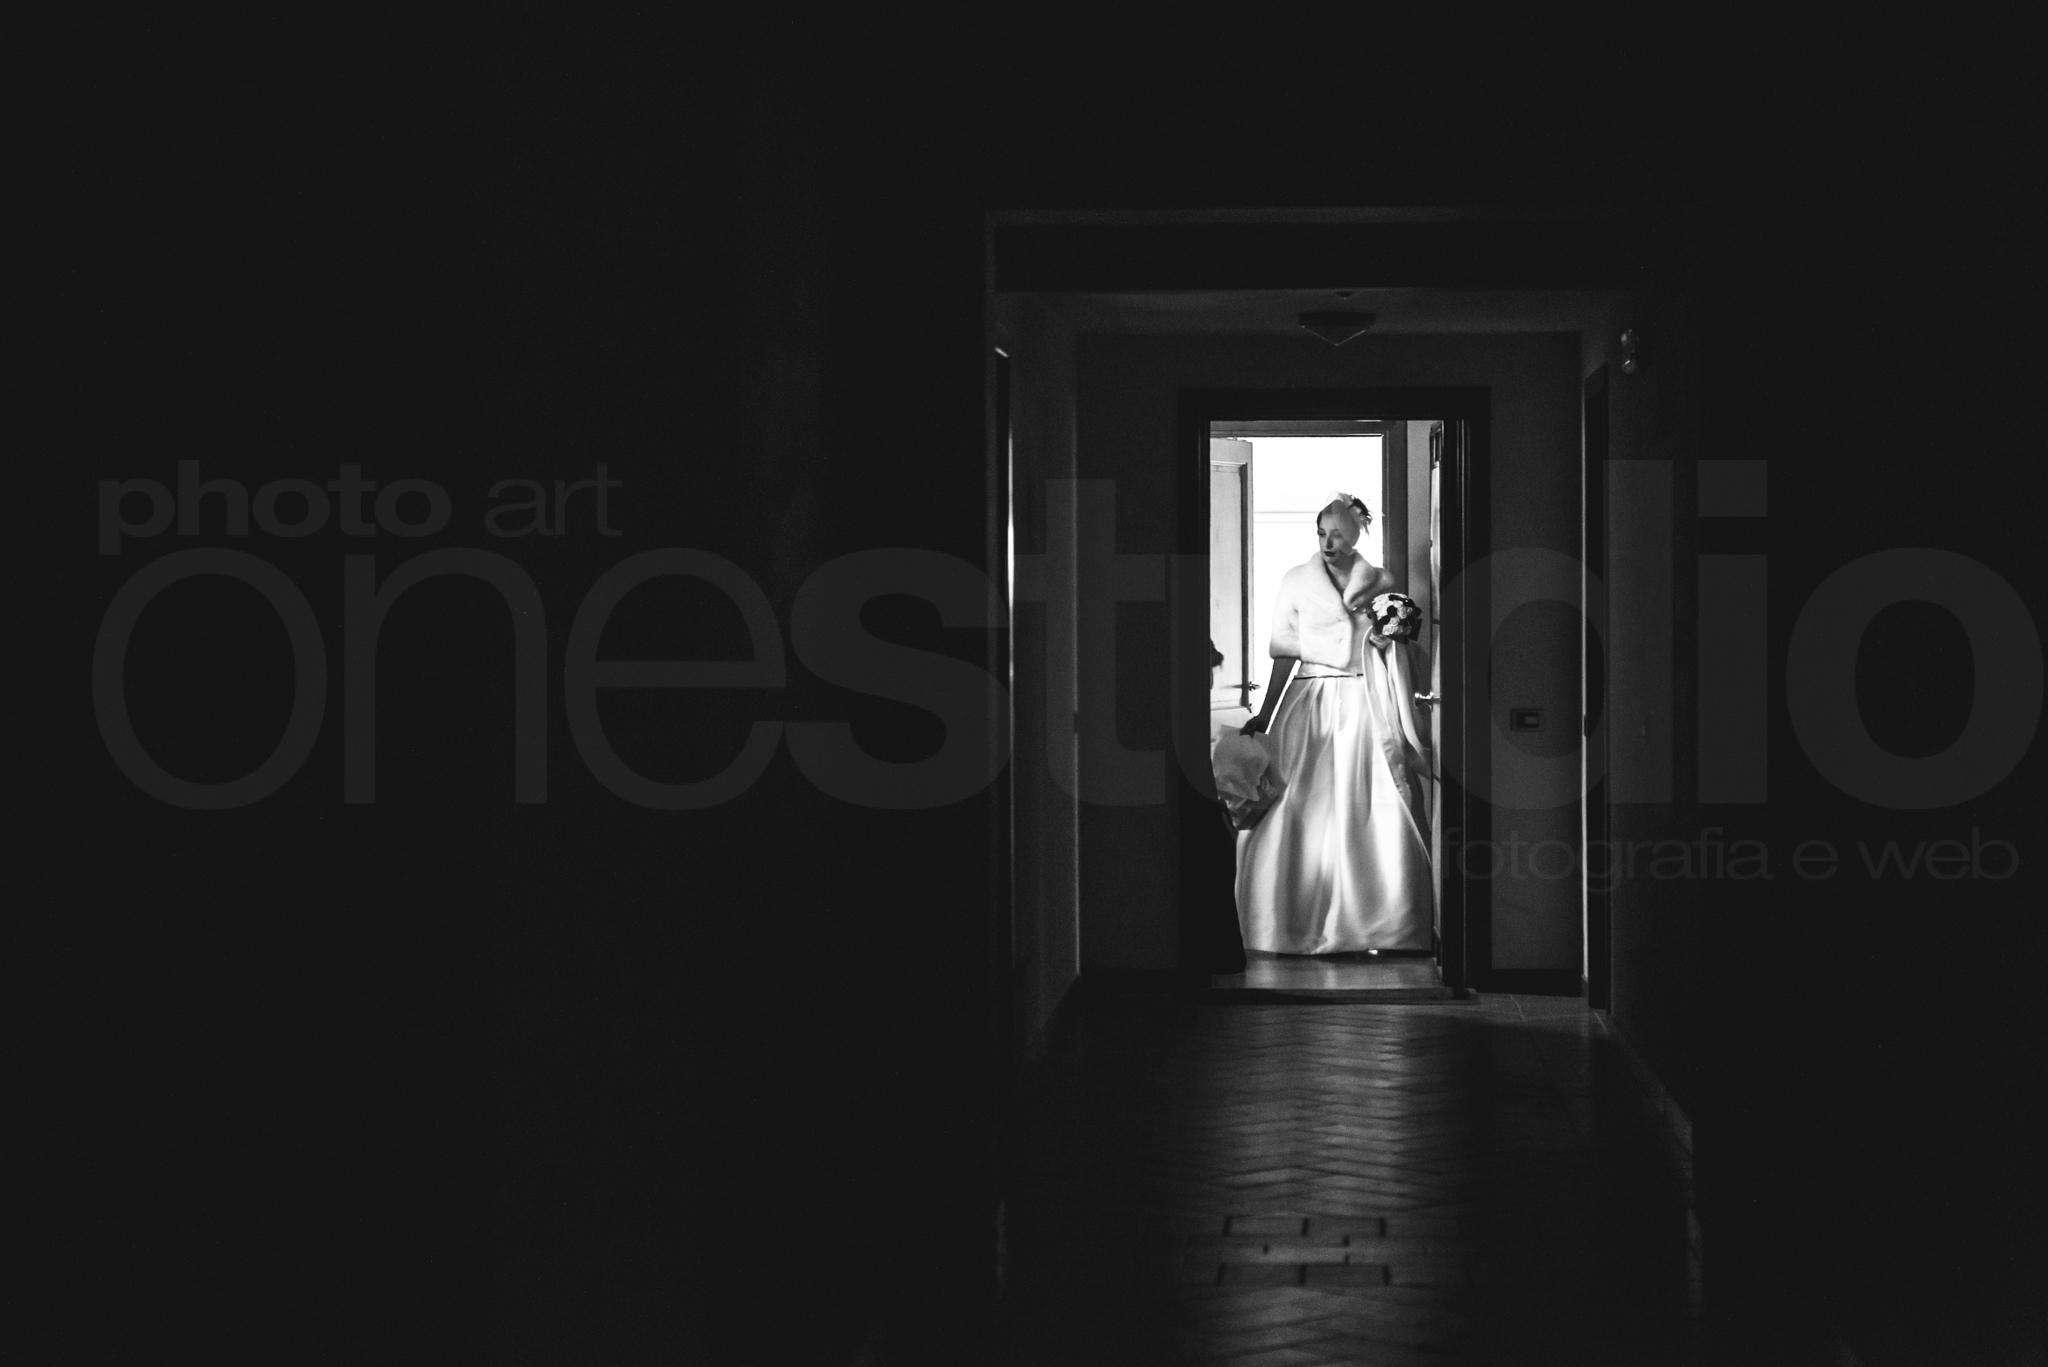 http://lnx.mirkone.it/wp-content/uploads/2015/07/fotografo-matrimoni-faenza-0026-3.jpg